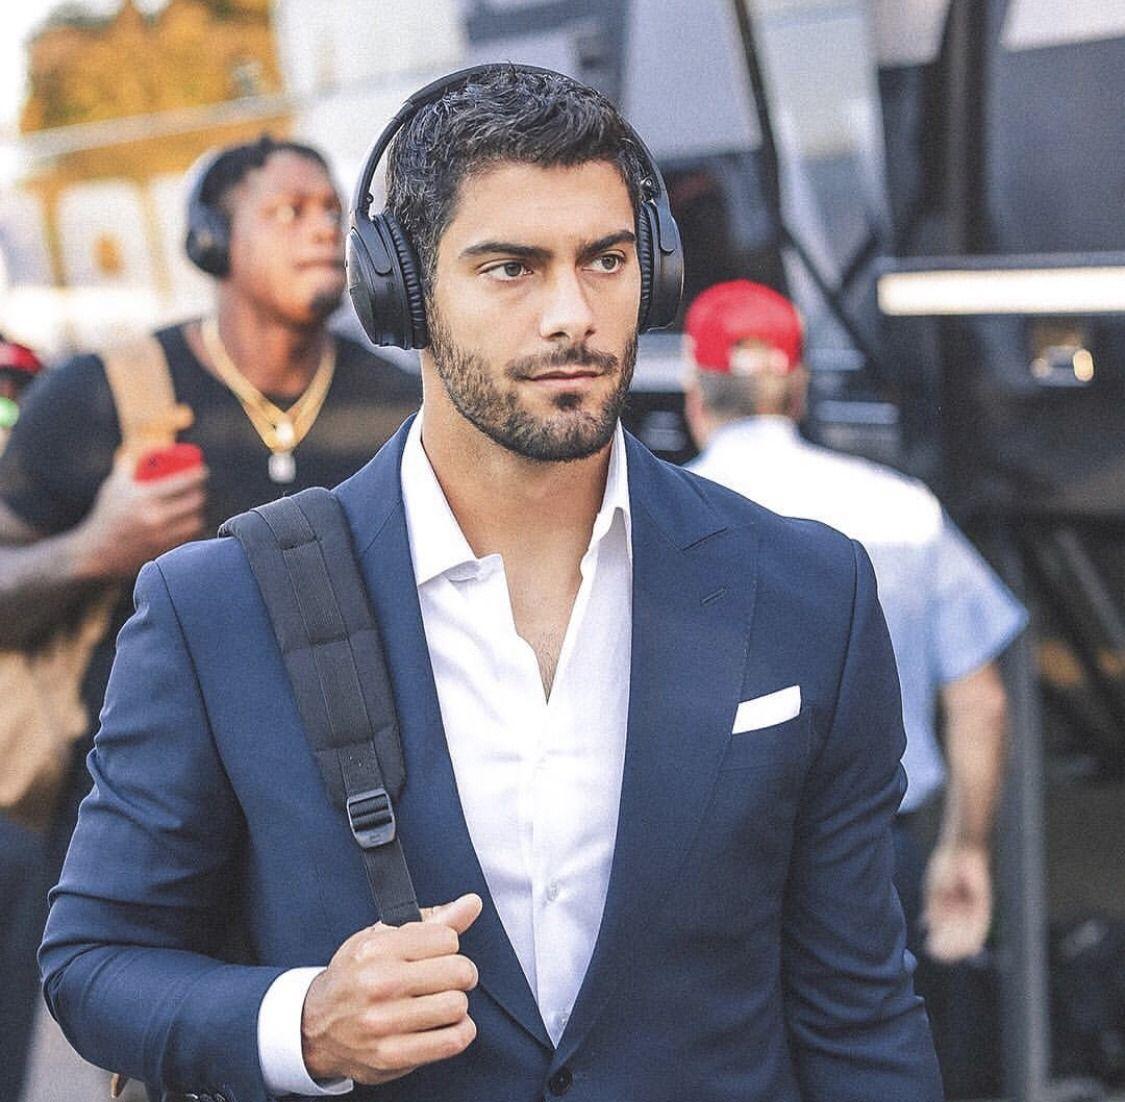 C Est La Vie In 2020 Beard Boy 49ers Football Handsome Men